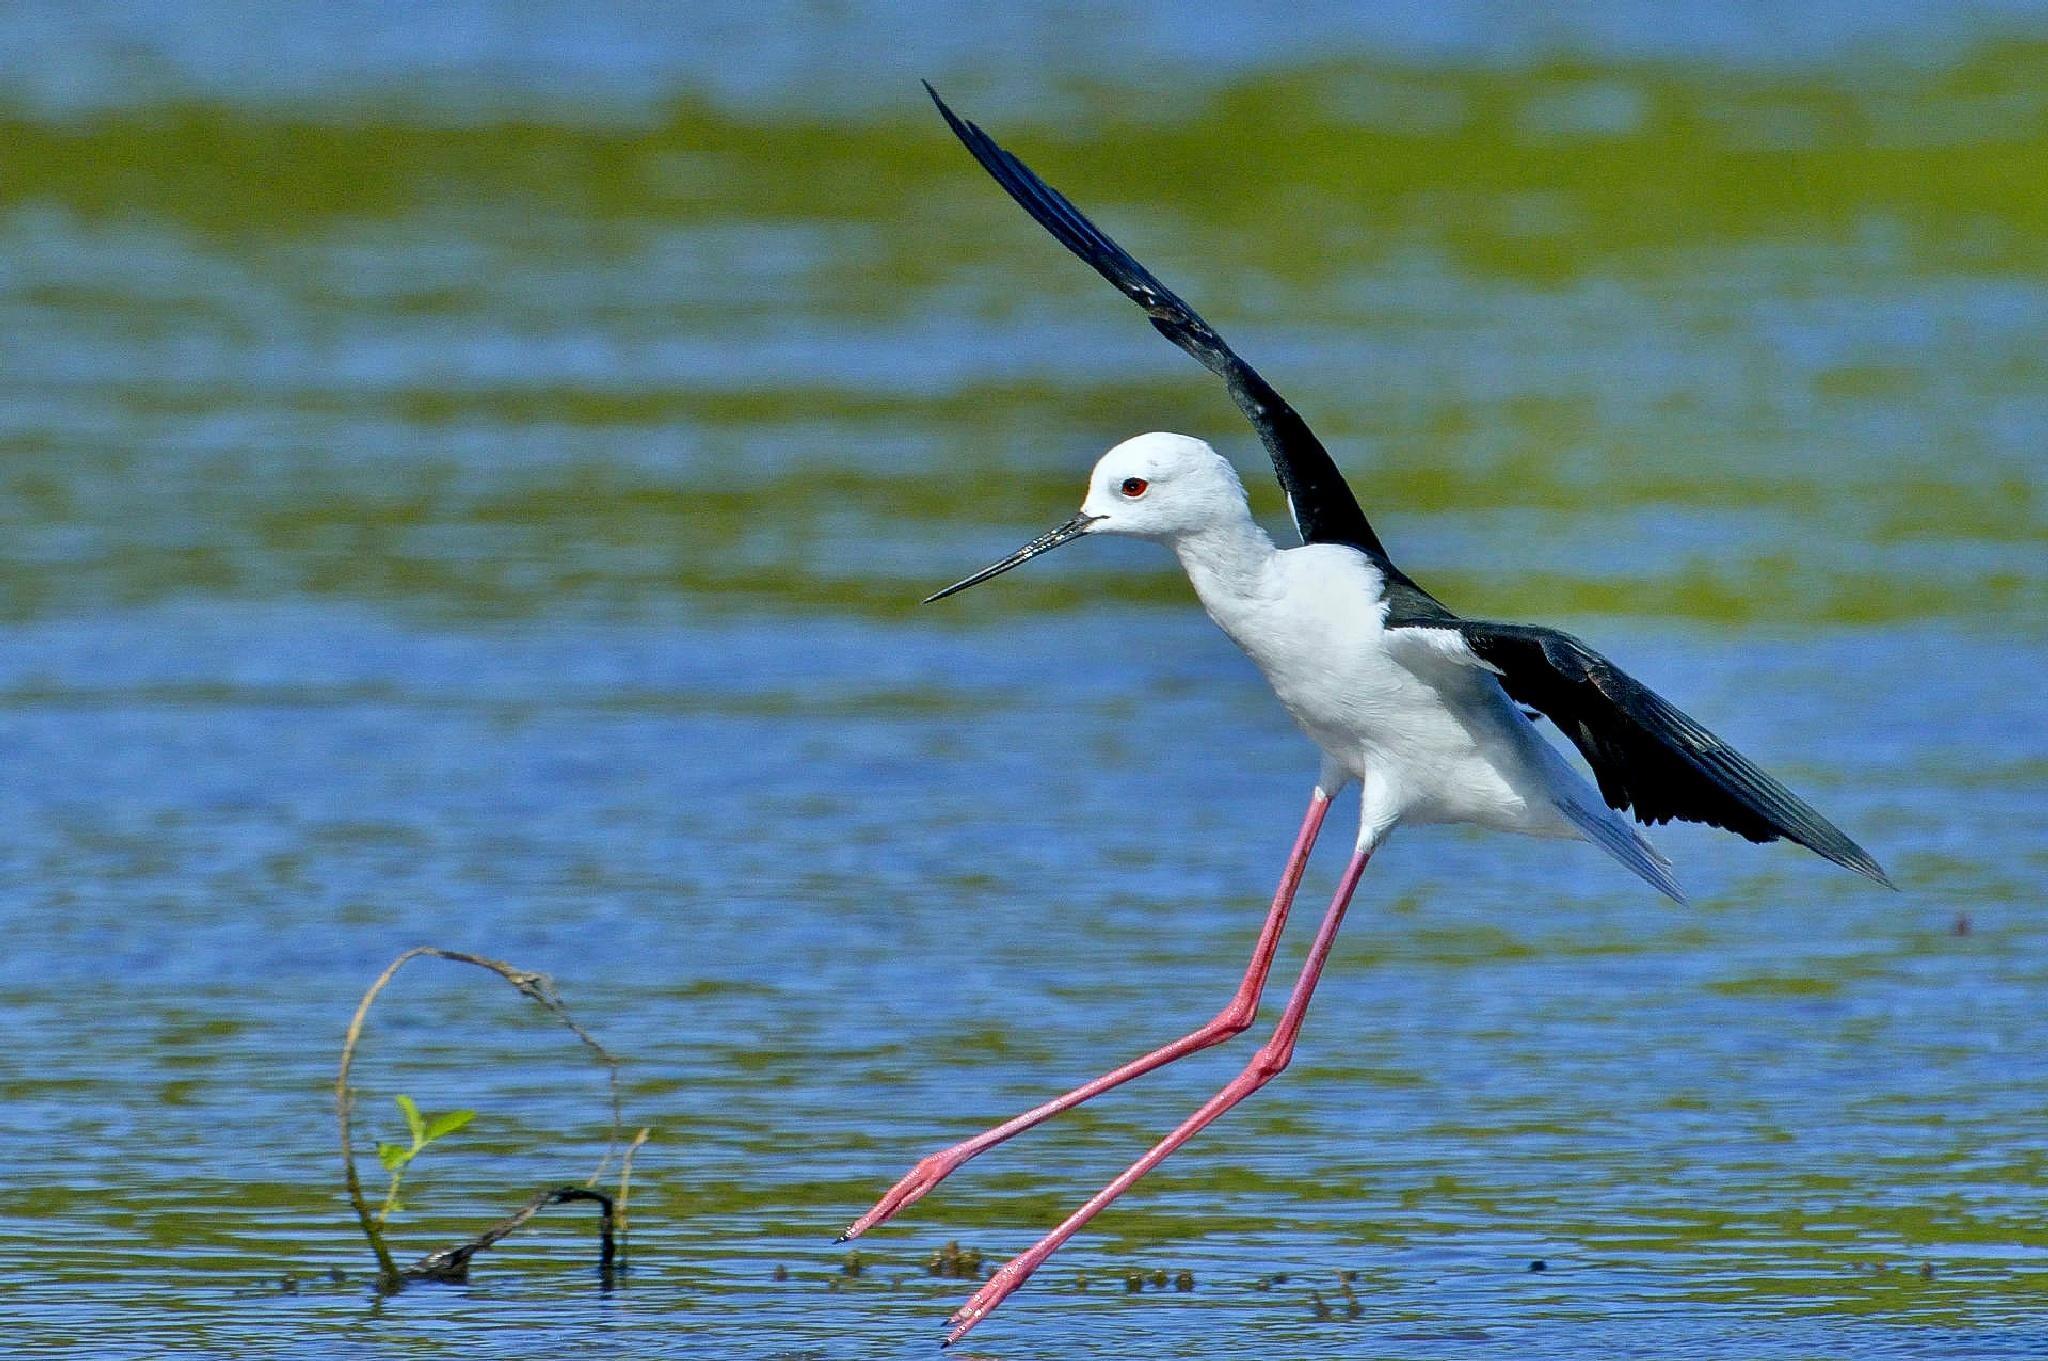 Black-winged Stilt by Sayeeram Rengaraj